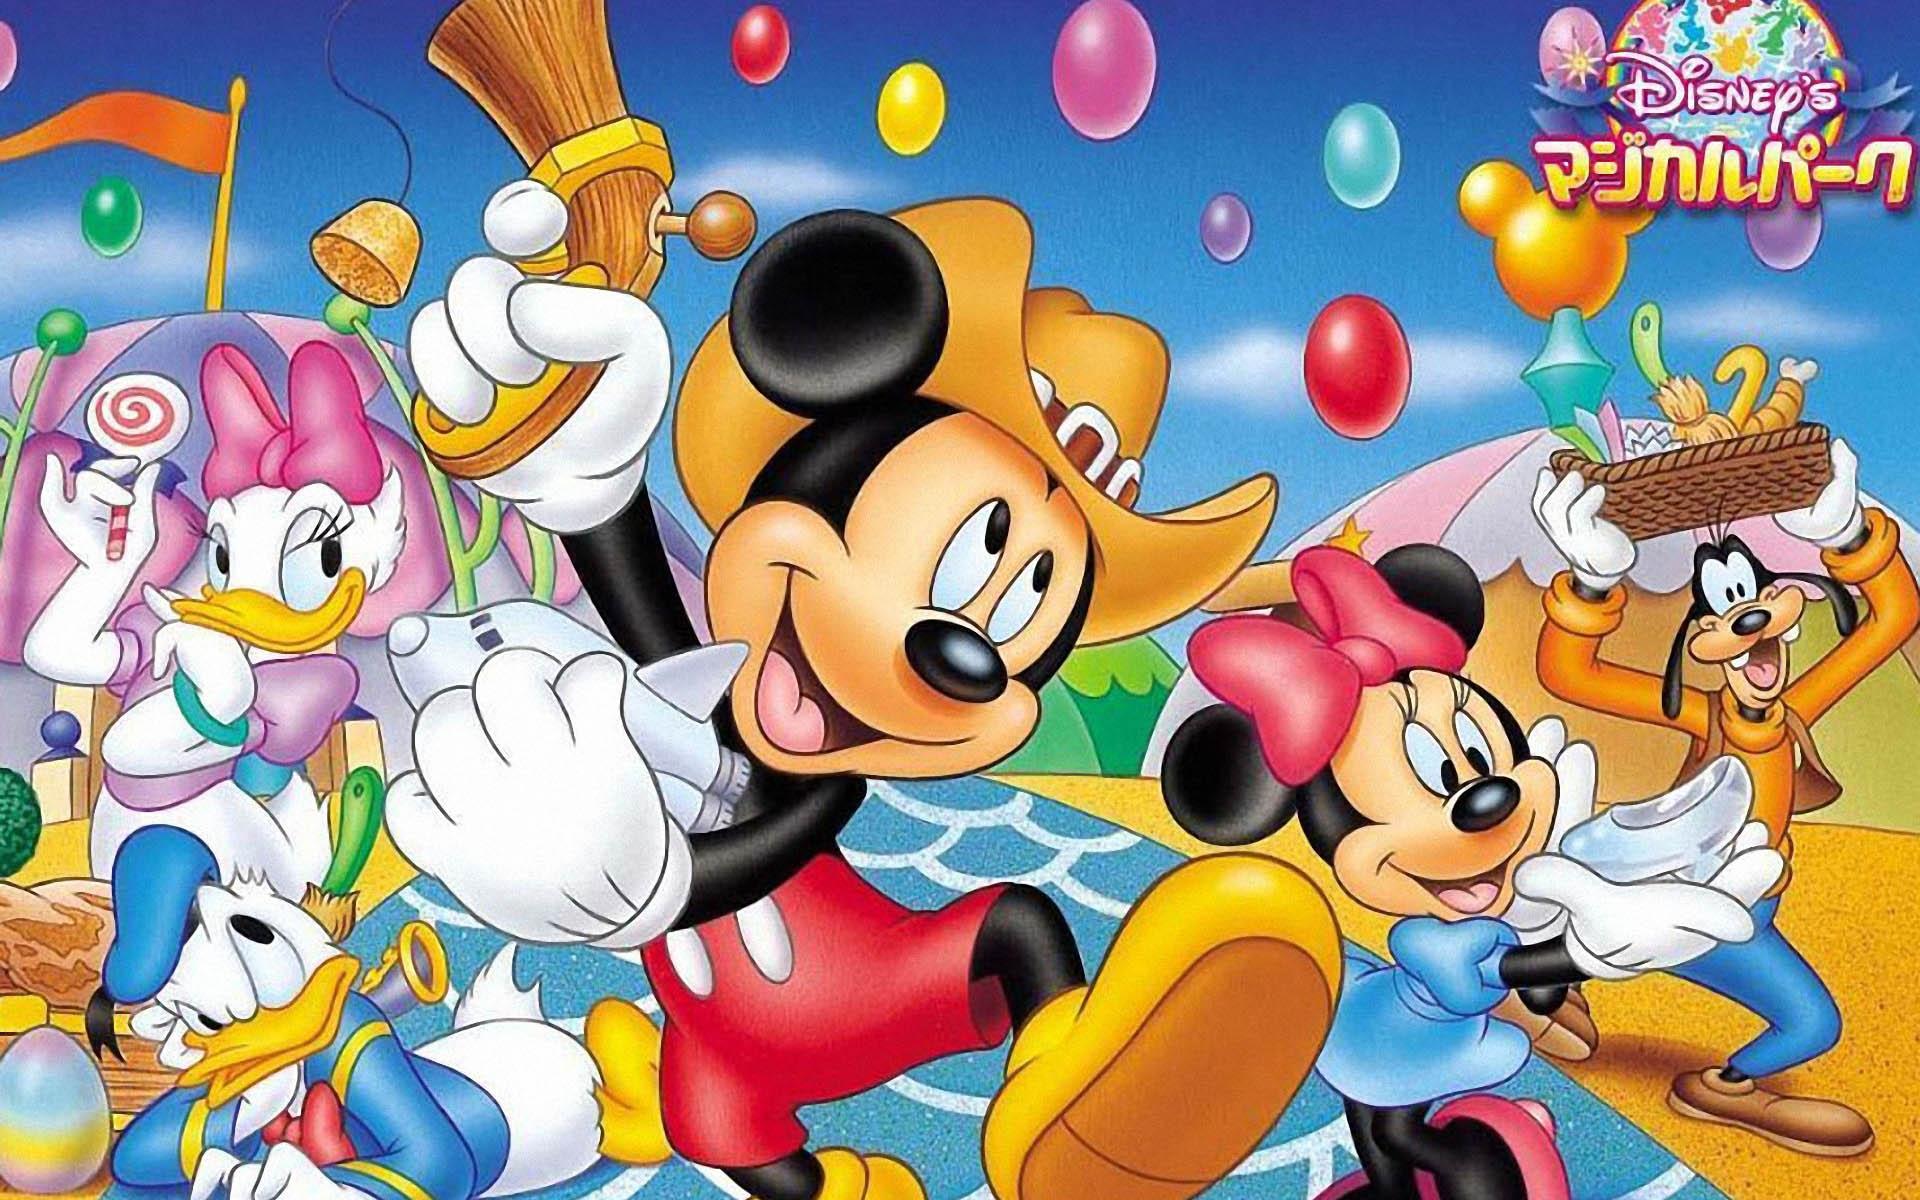 Mickey Mouse Carpet HD Desktop Wallpapers digitalhintnet 1920x1200